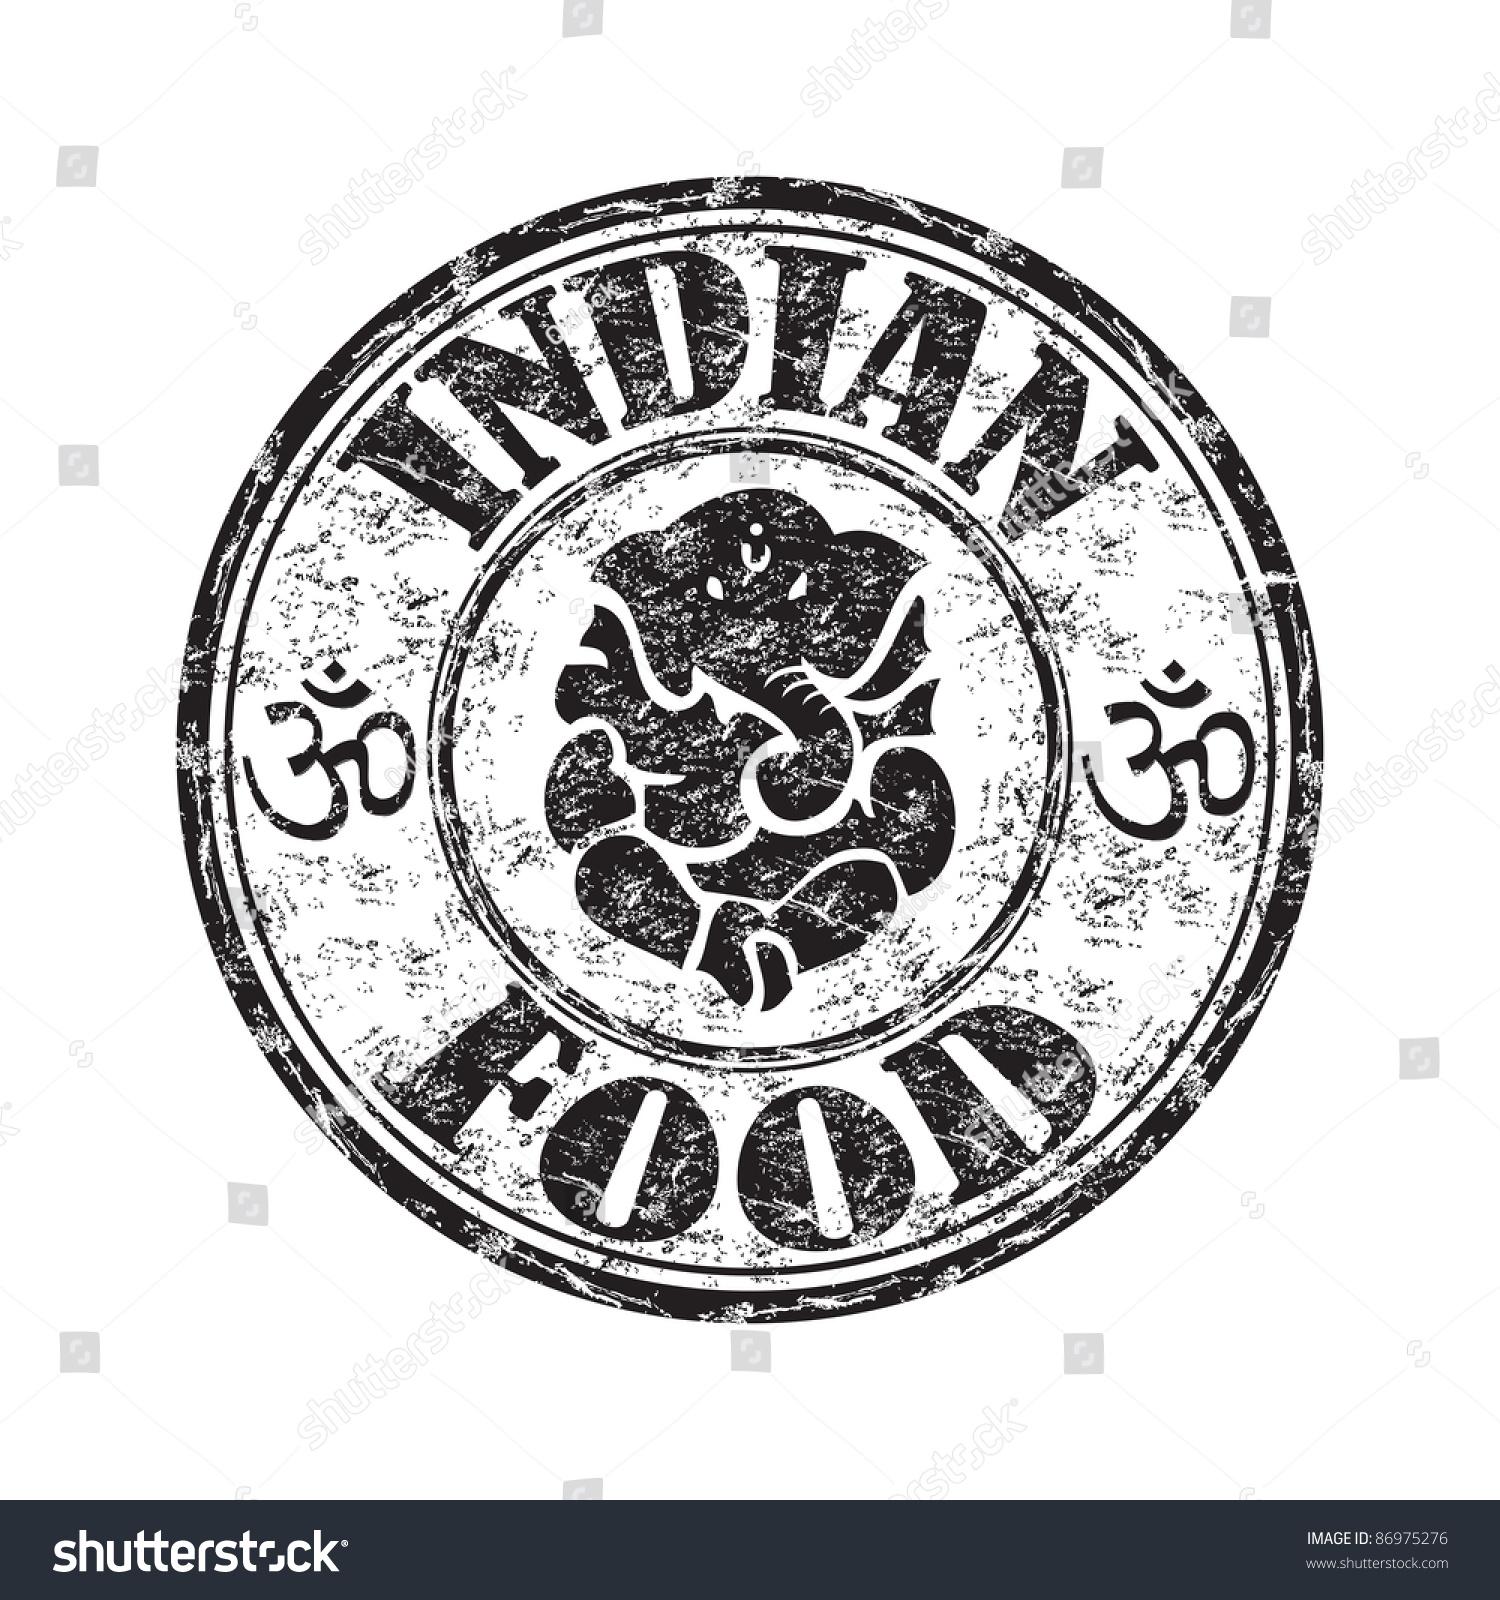 Black grunge rubber stamp indian elephant stock vector 86975276 black grunge rubber stamp with an indian elephant symbol and the text indian food written inside buycottarizona Images